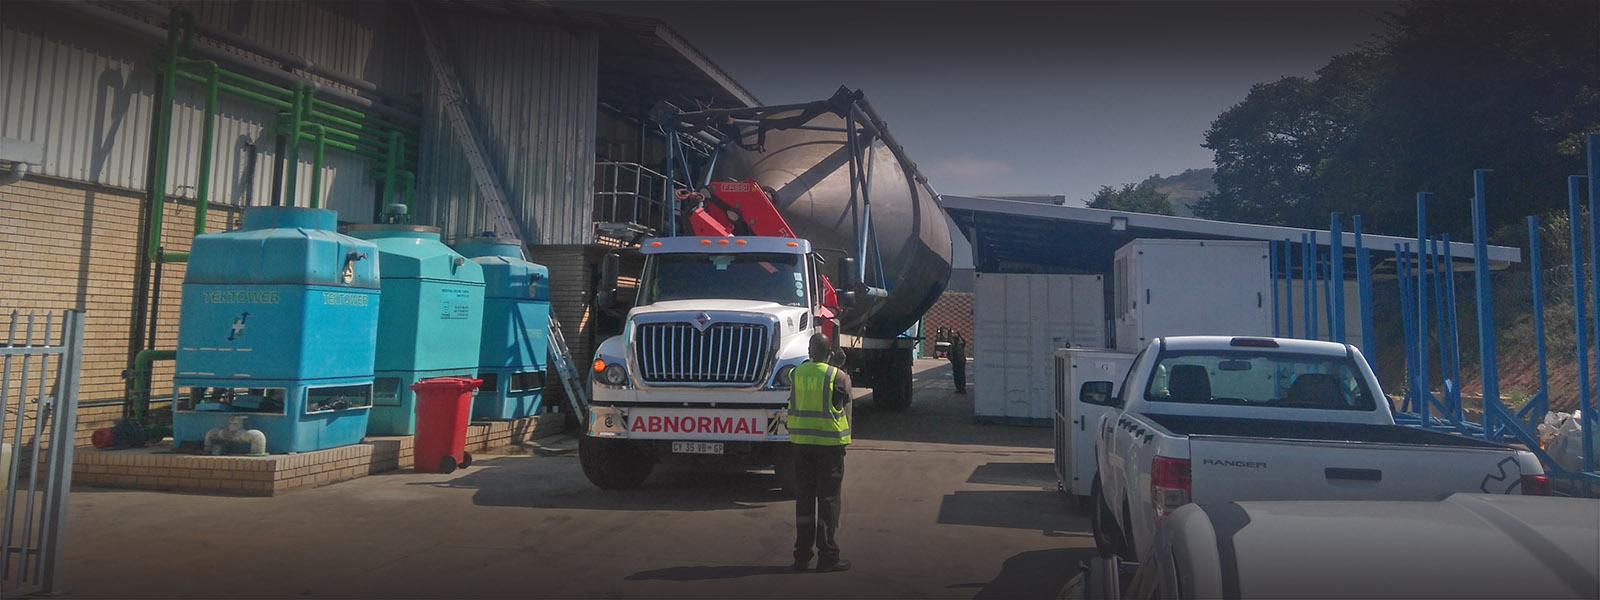 transport-long-distance-vehicles-transport-crane-truck-mme-Machine-Moving-Engineering-experts-machinery-equipment-Gauteng